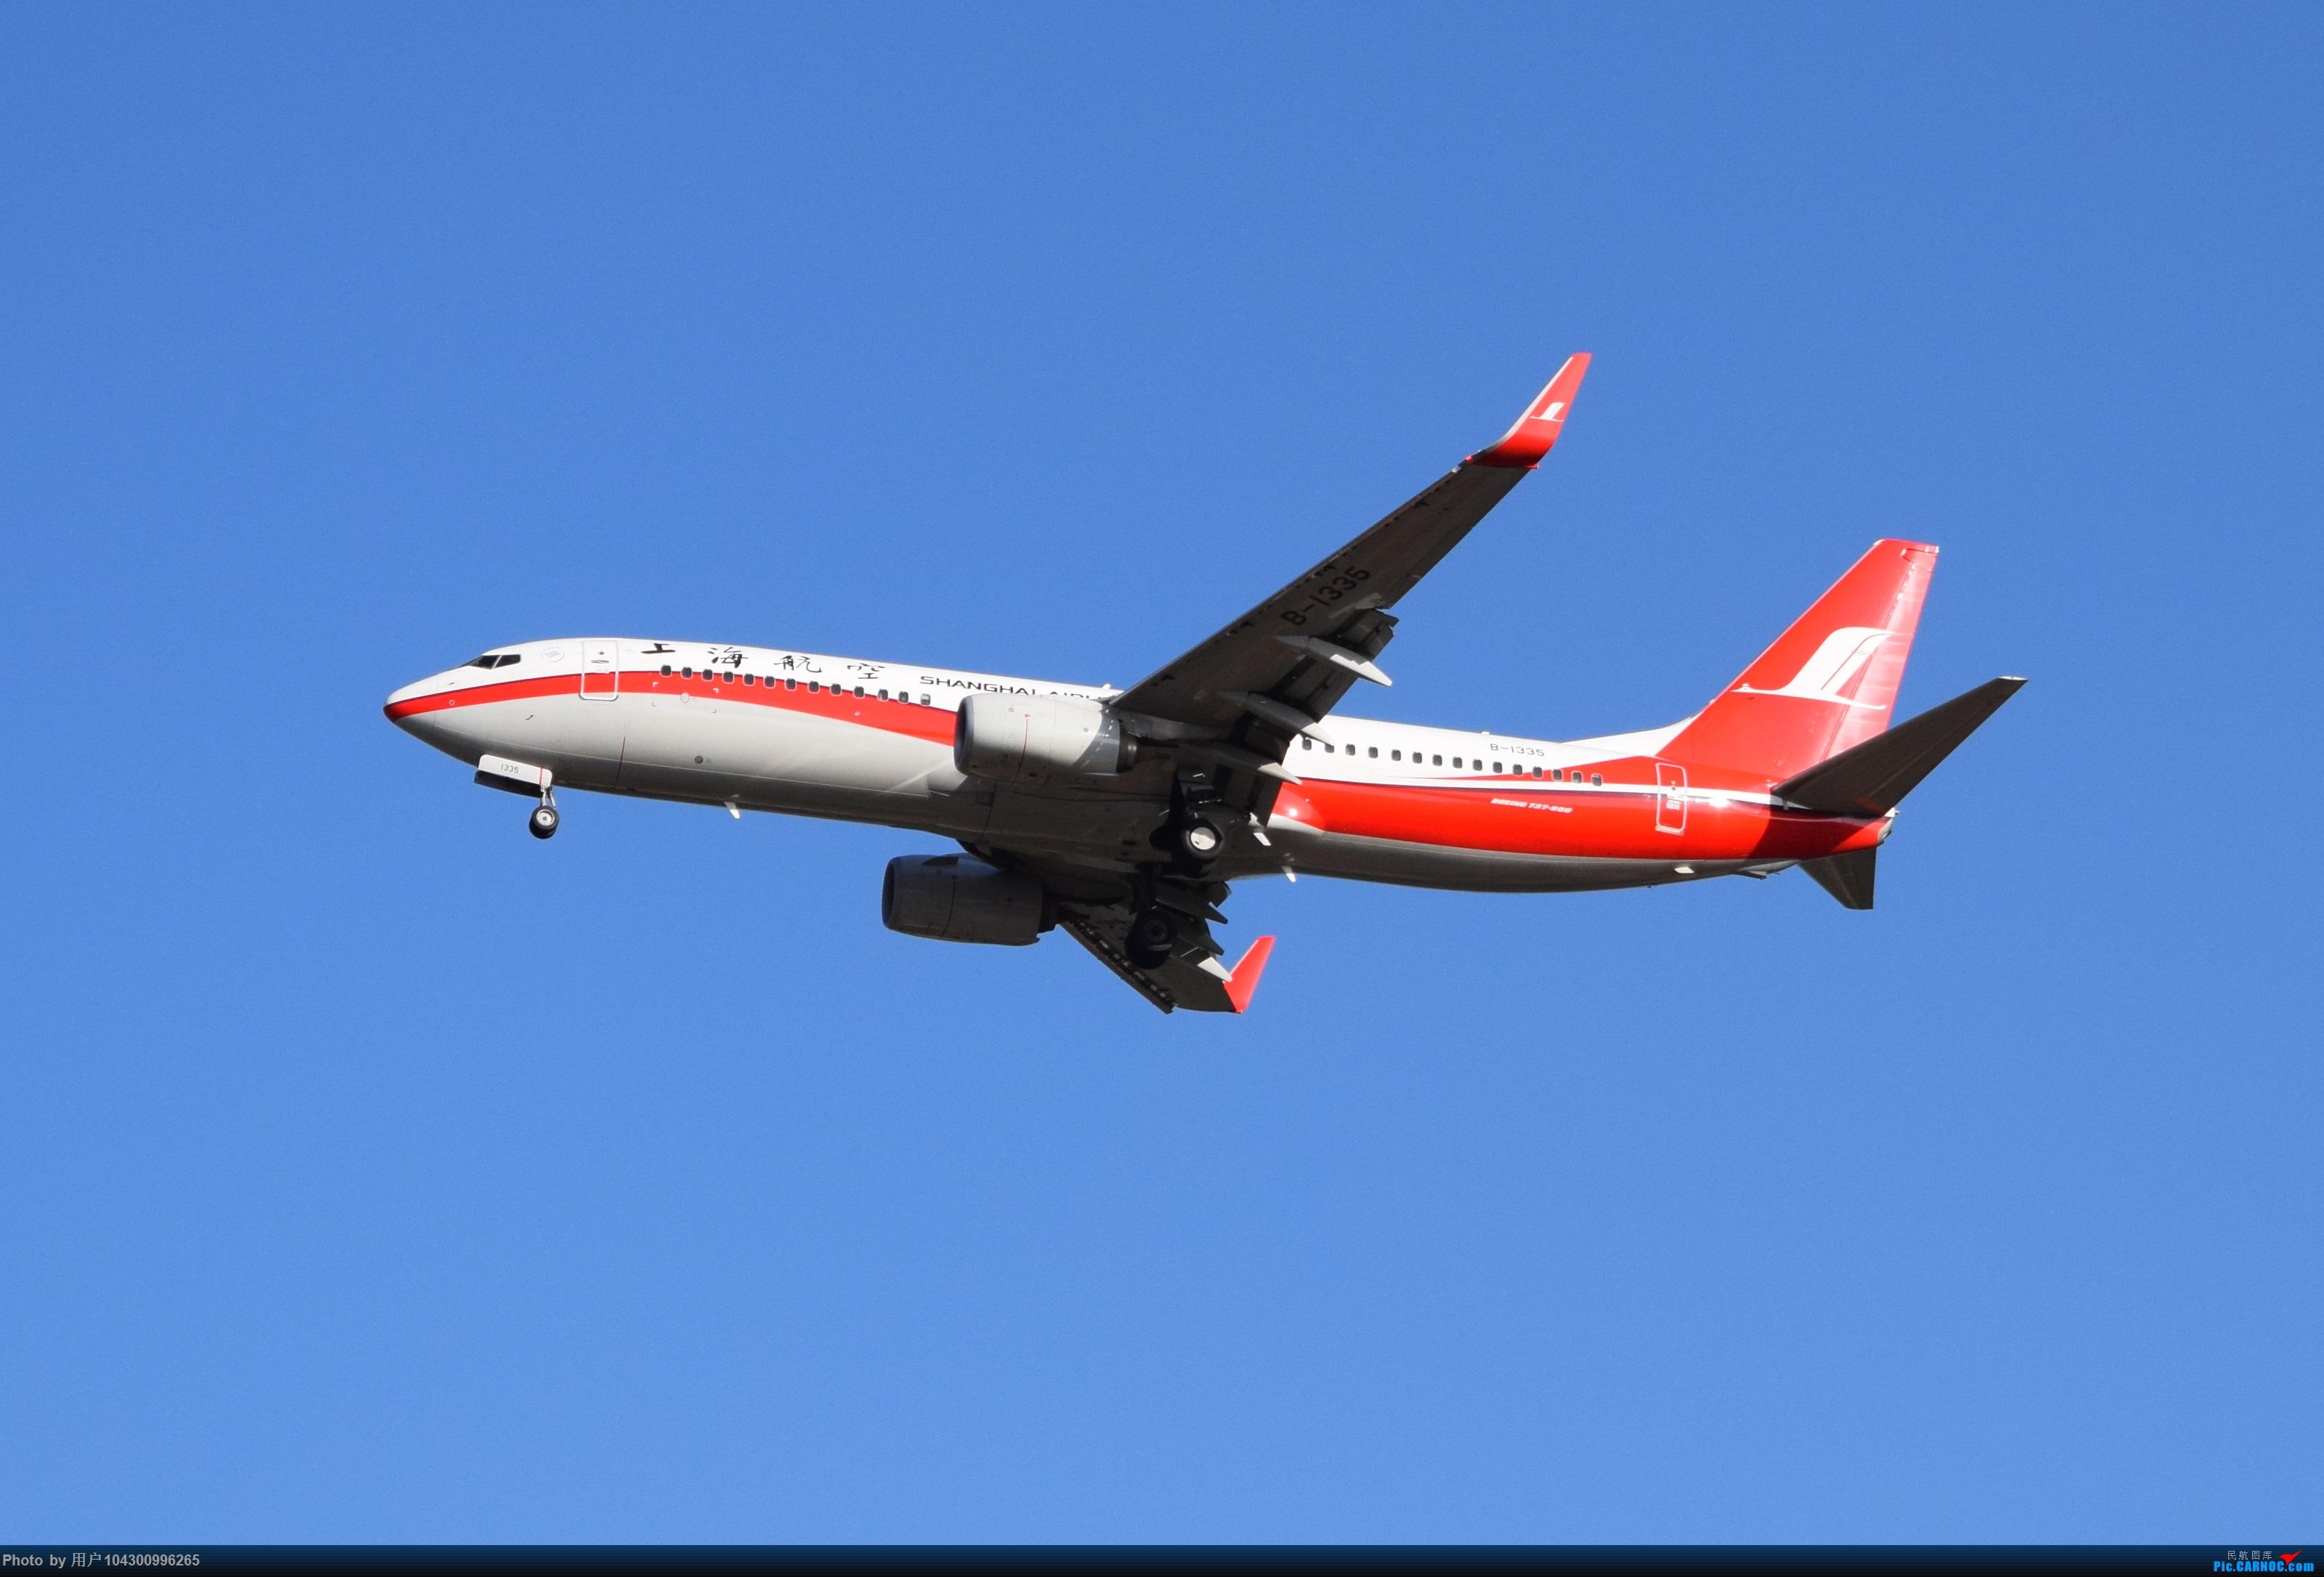 Re:[原创][KWE]贵阳今天天气不错,随便拍几张! BOEING 737-800 B-1335 中国贵阳龙洞堡国际机场